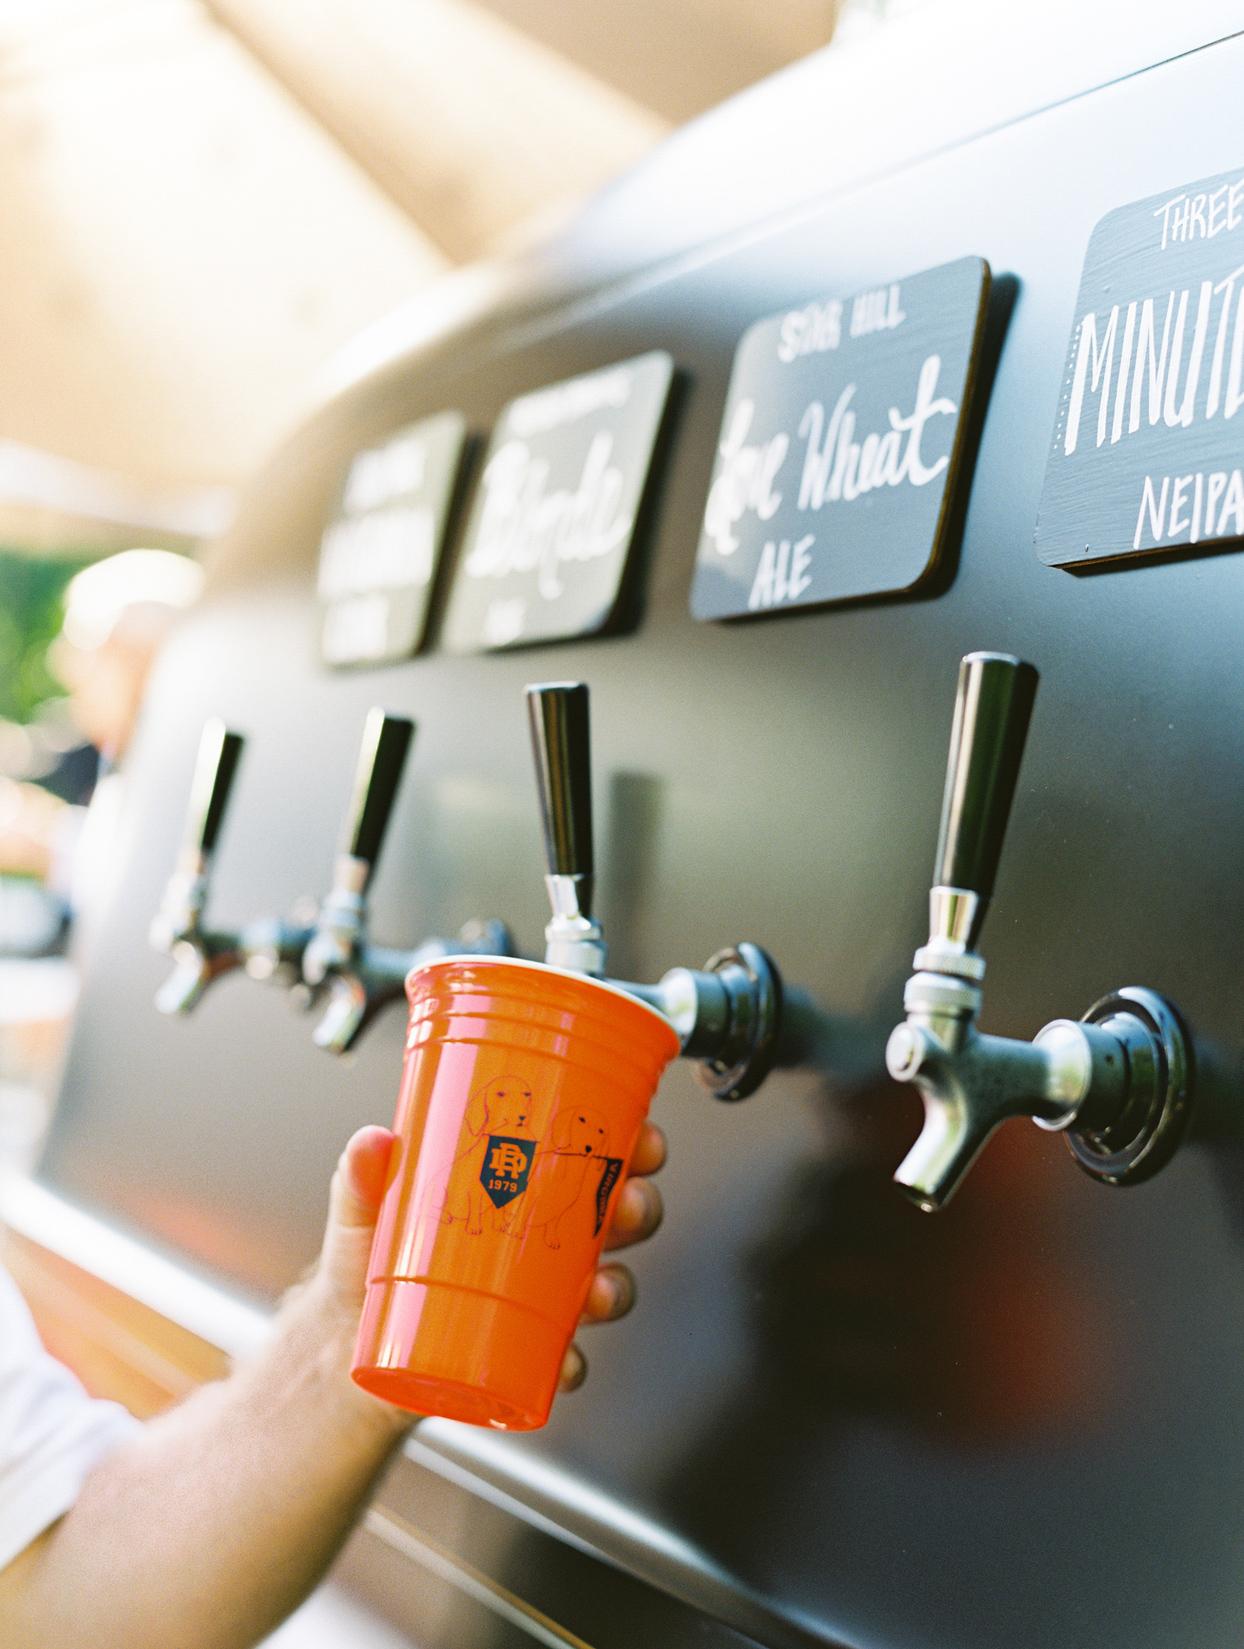 beer tap filling orange cup